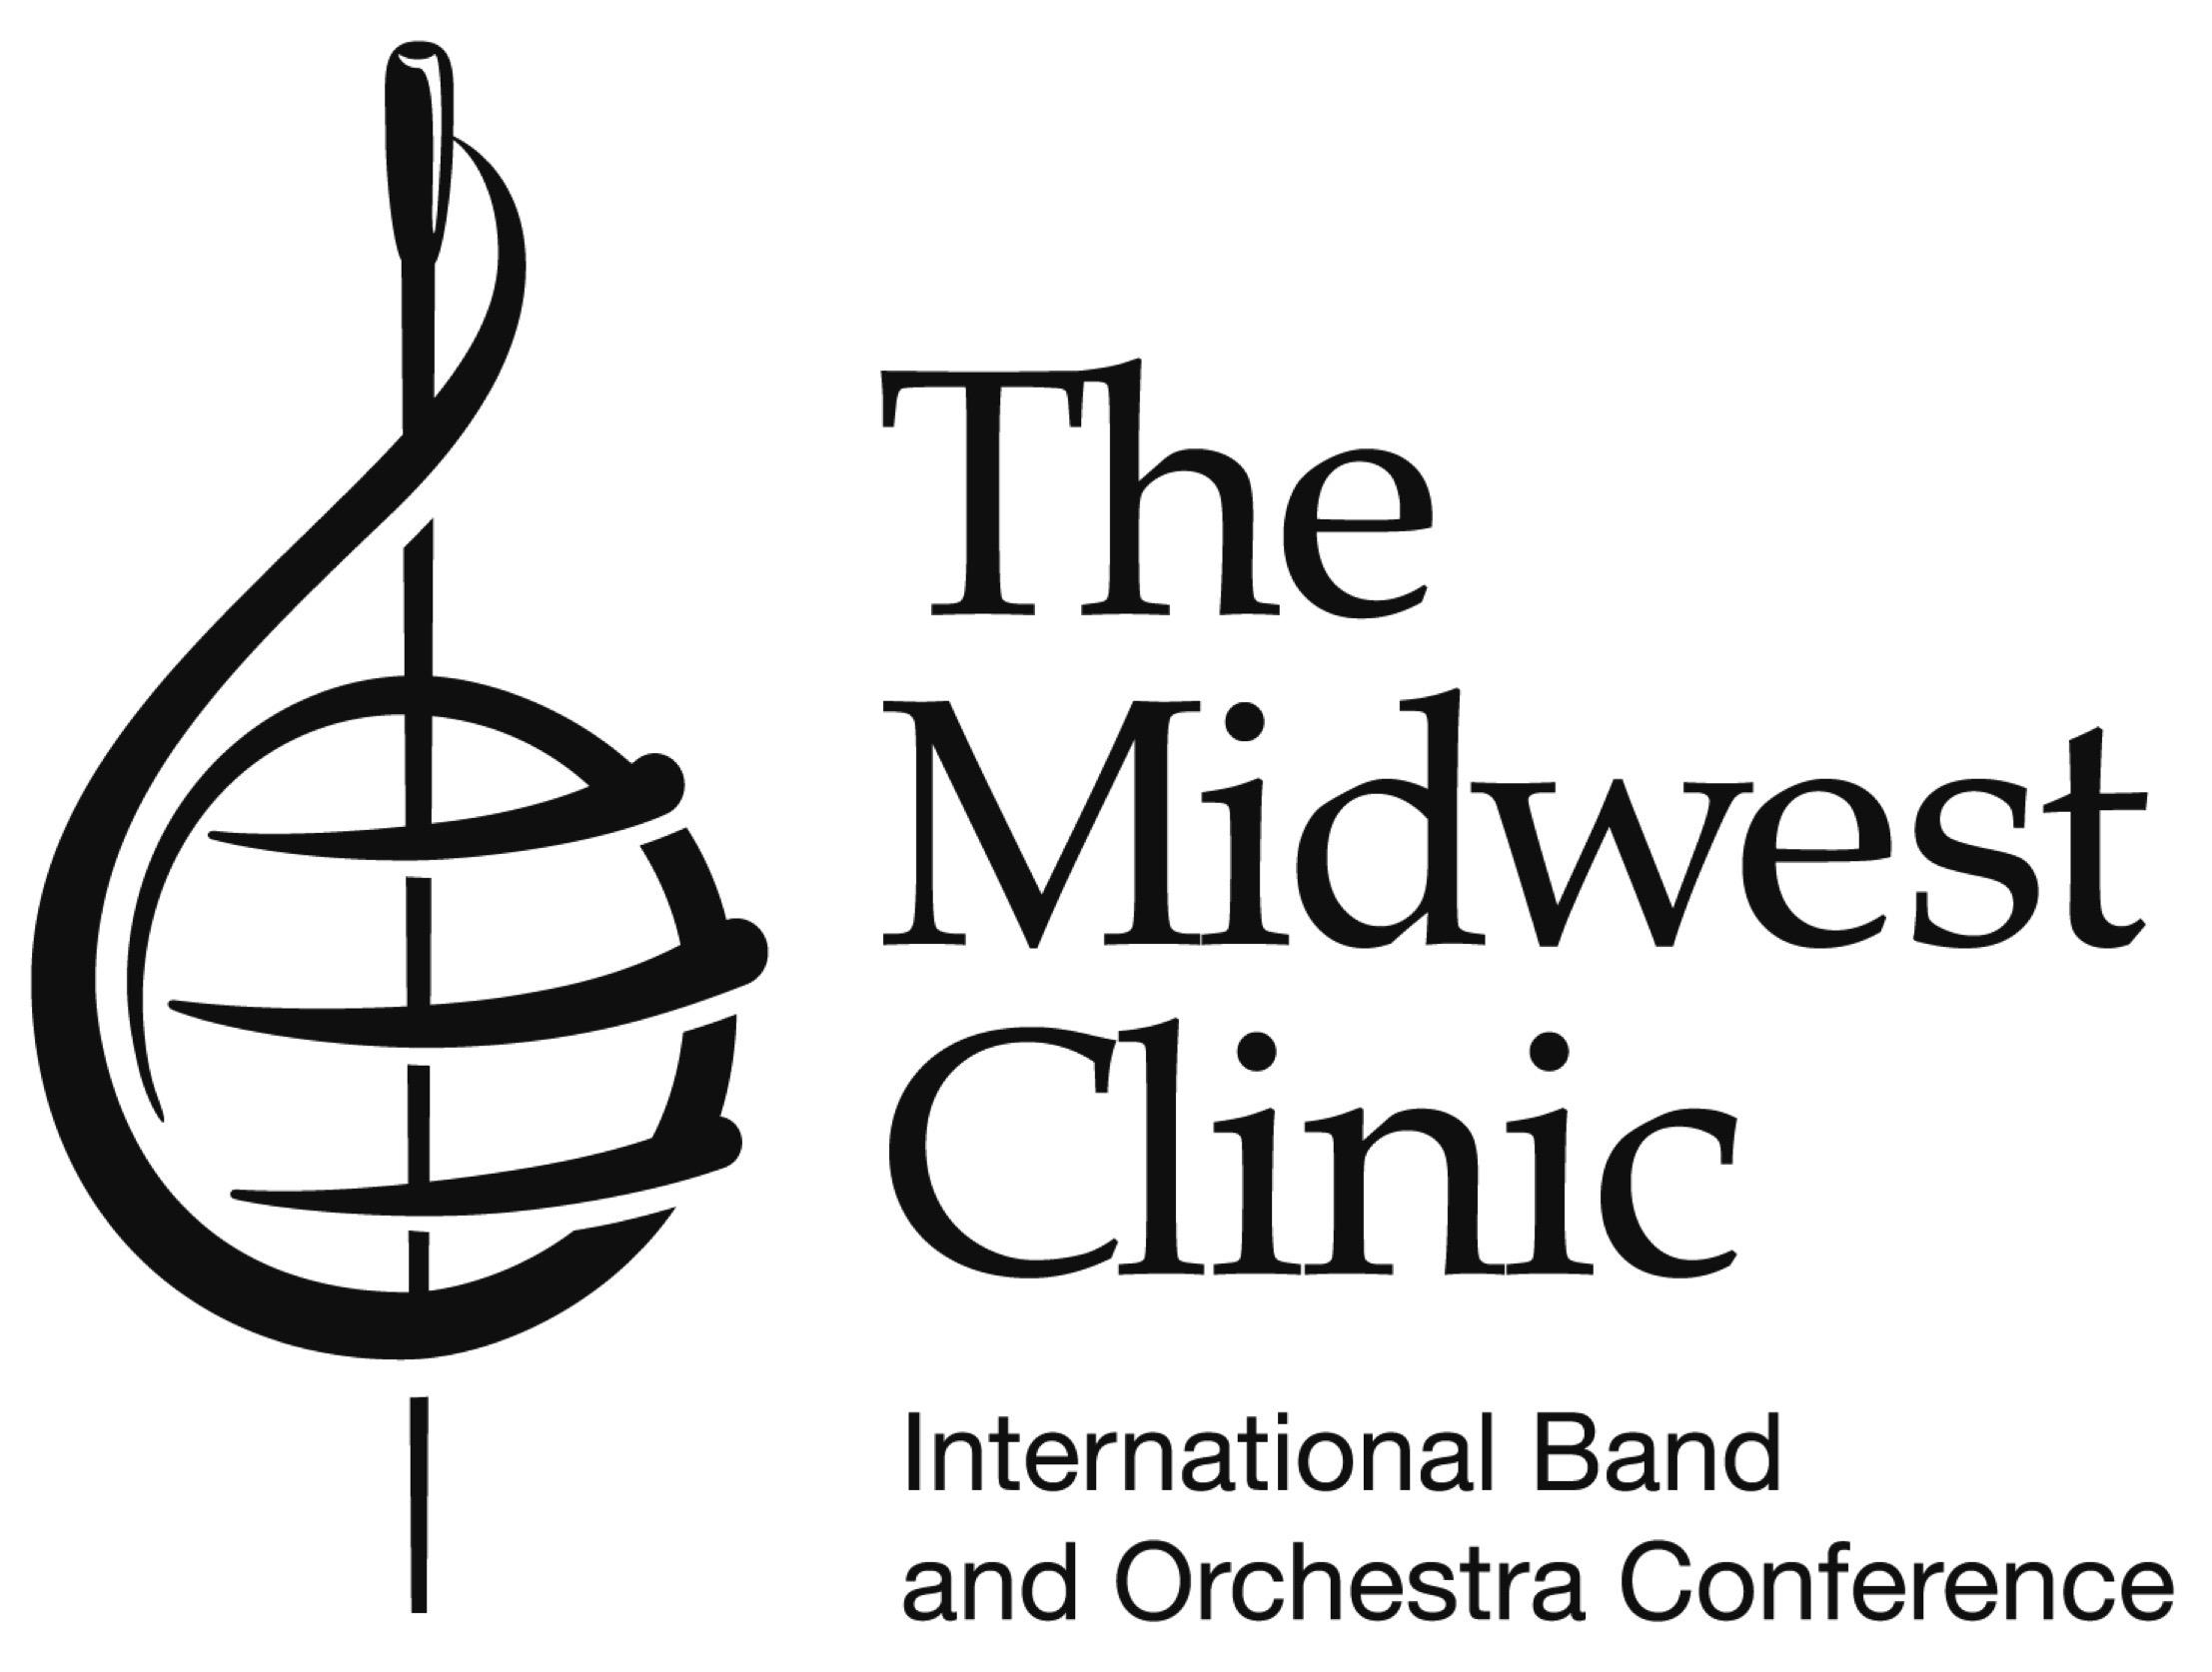 Midwest black logo.jpg